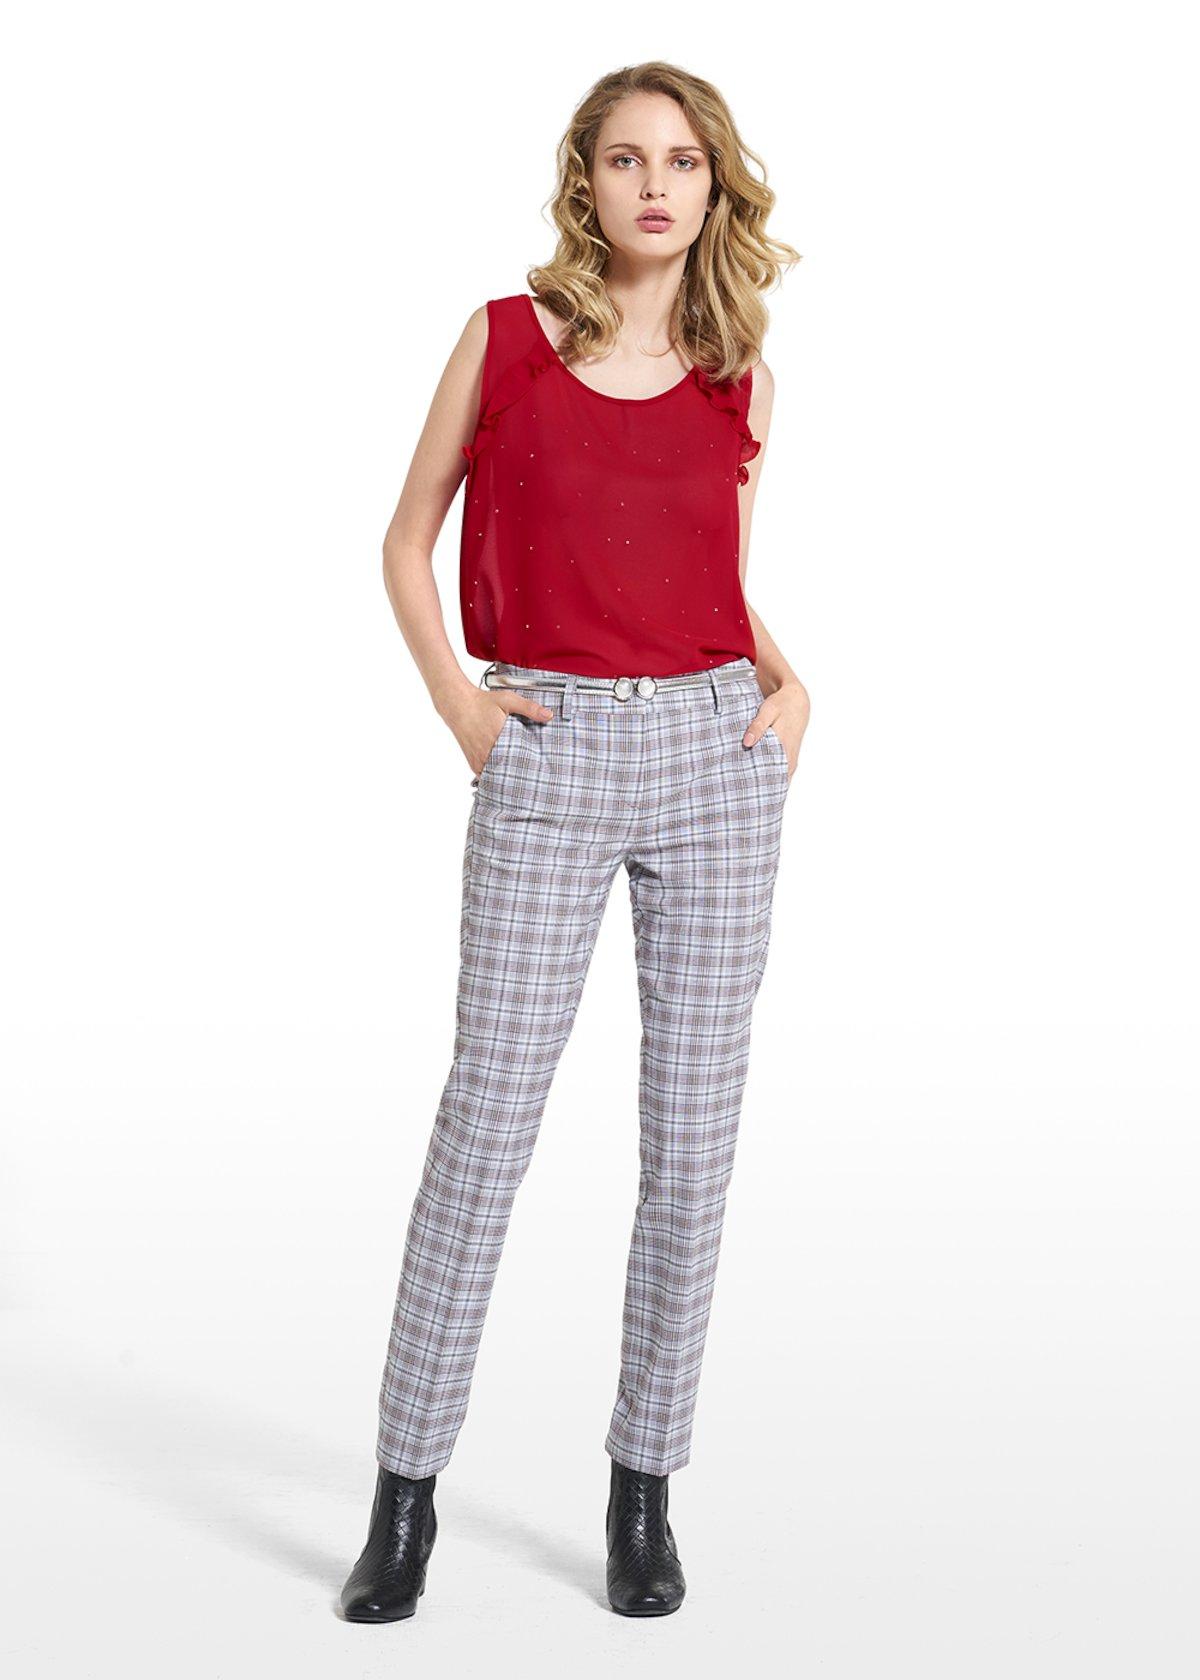 Slim leg pants Paride in Prince of Wales fabric